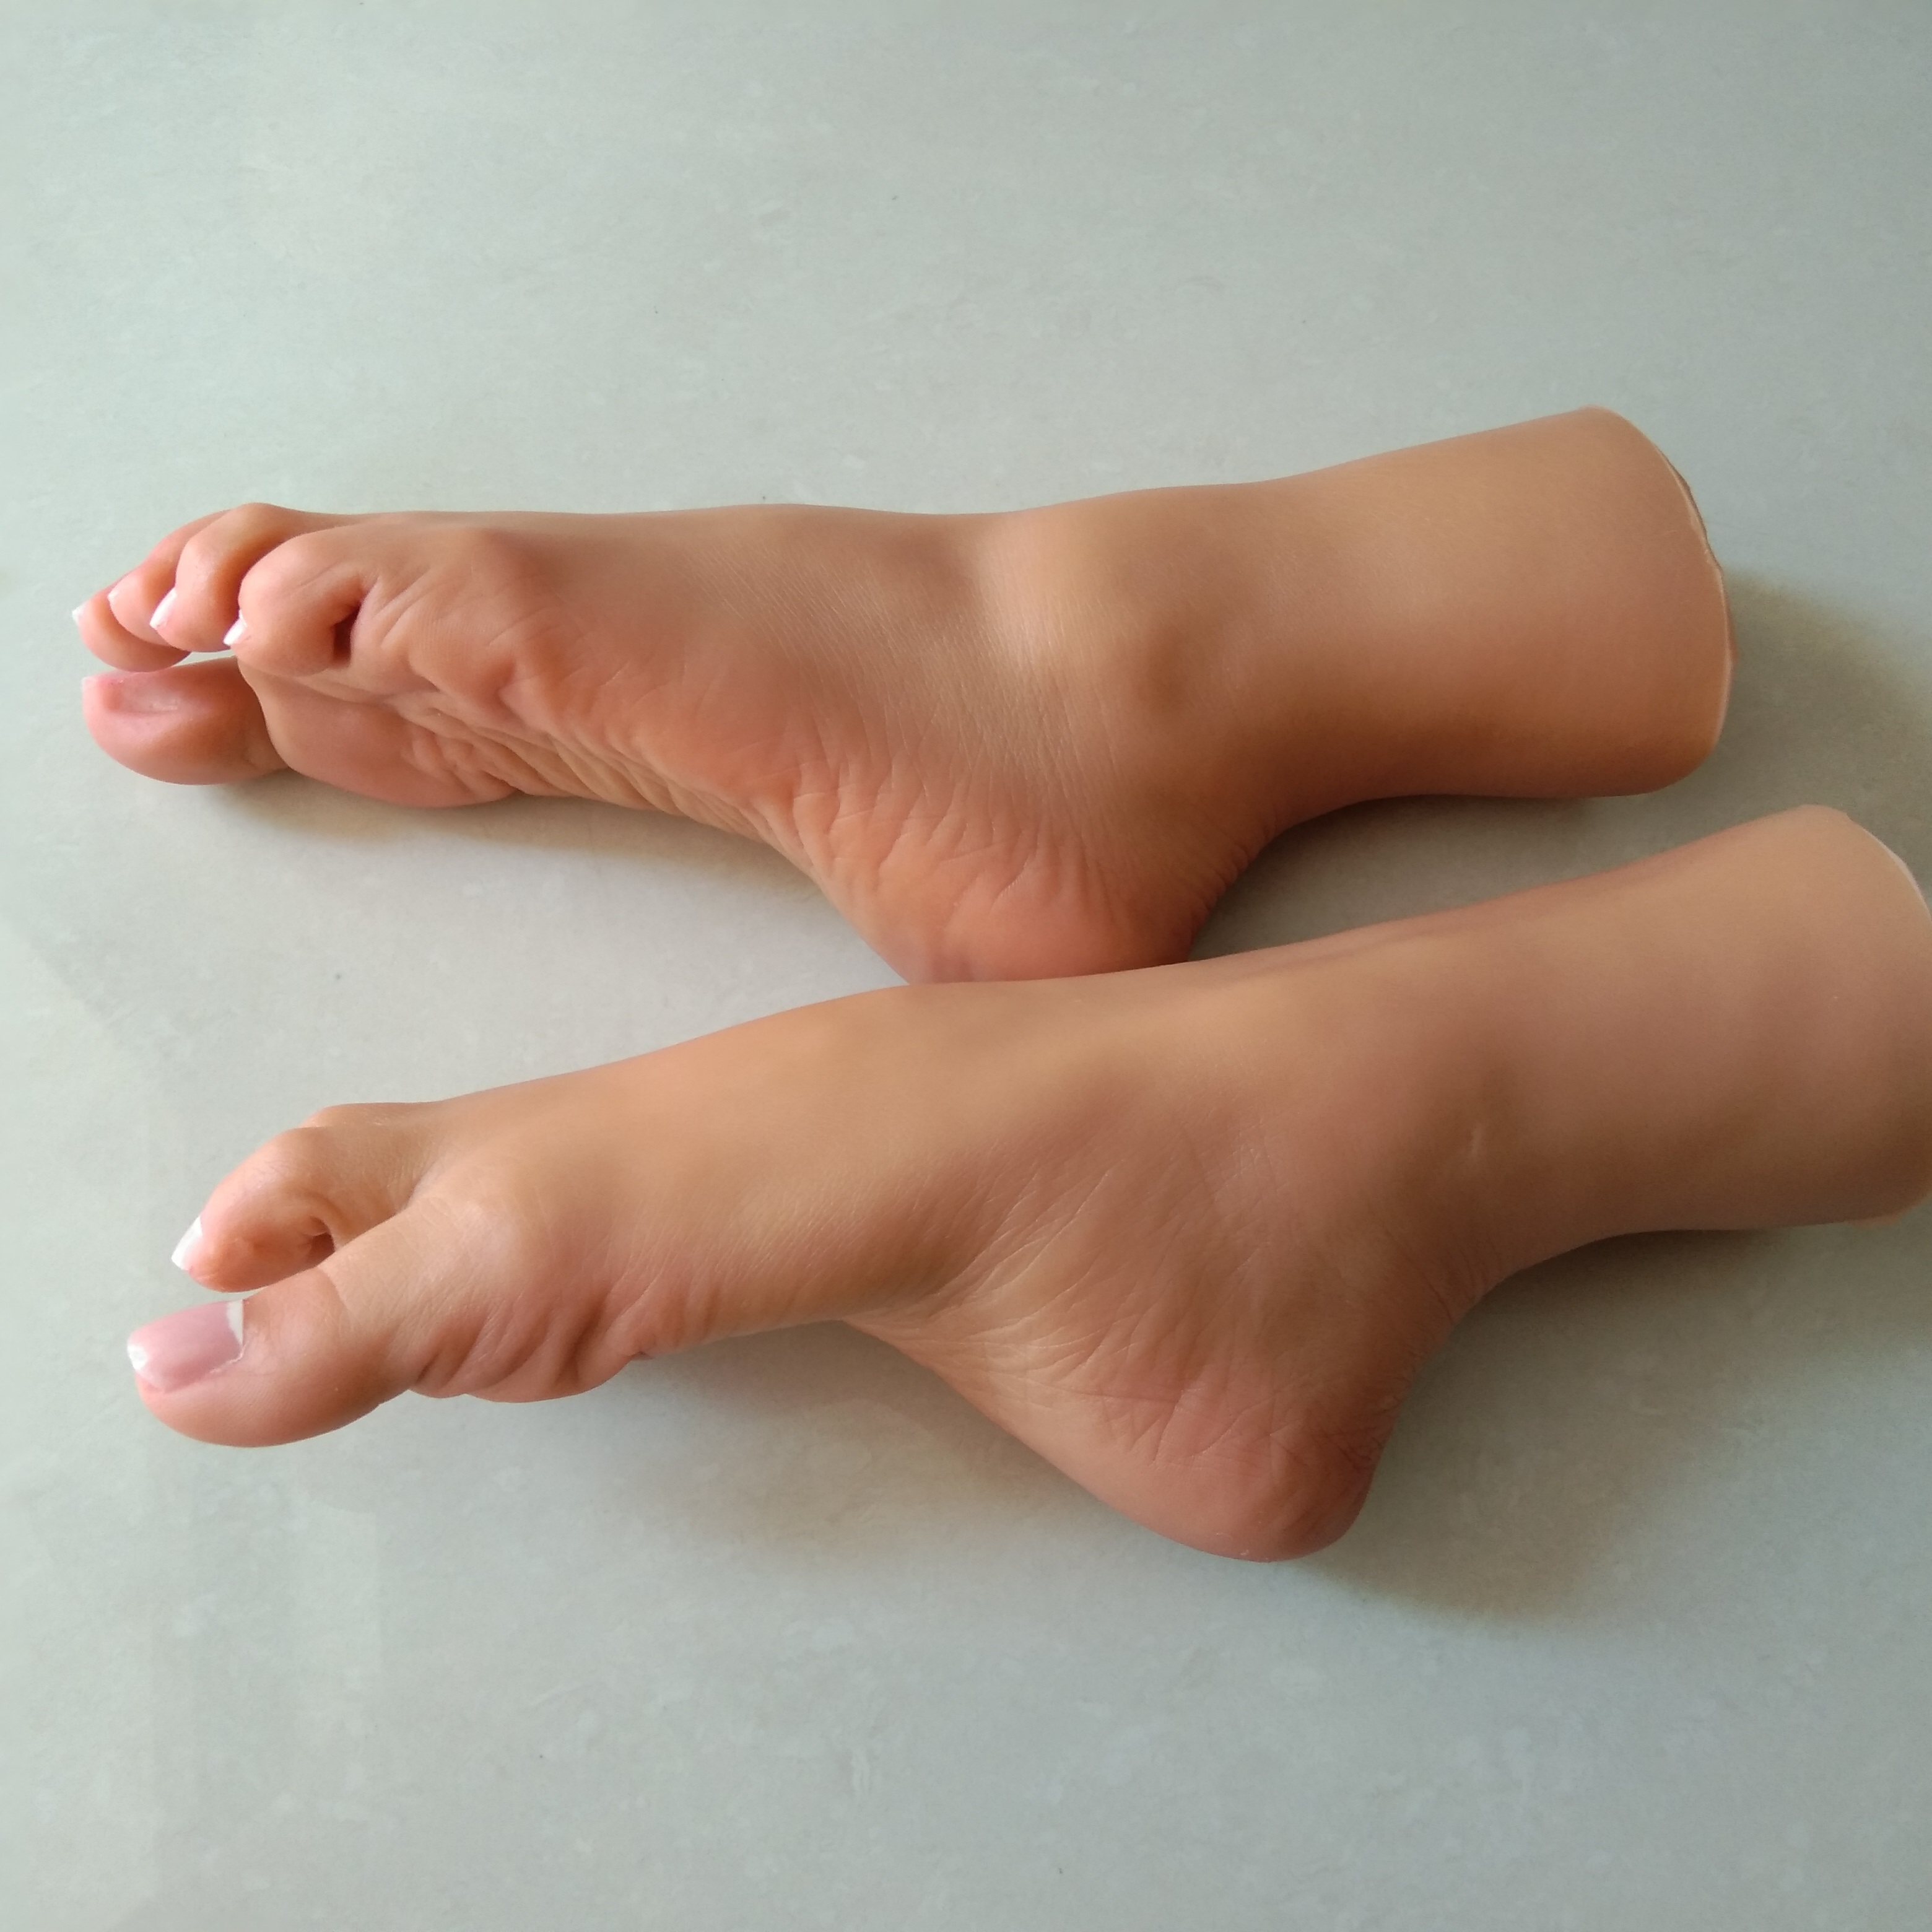 lifelike silicone sex dolls new girls allure foot feet fetish toys fake foot model 1pair tan skin